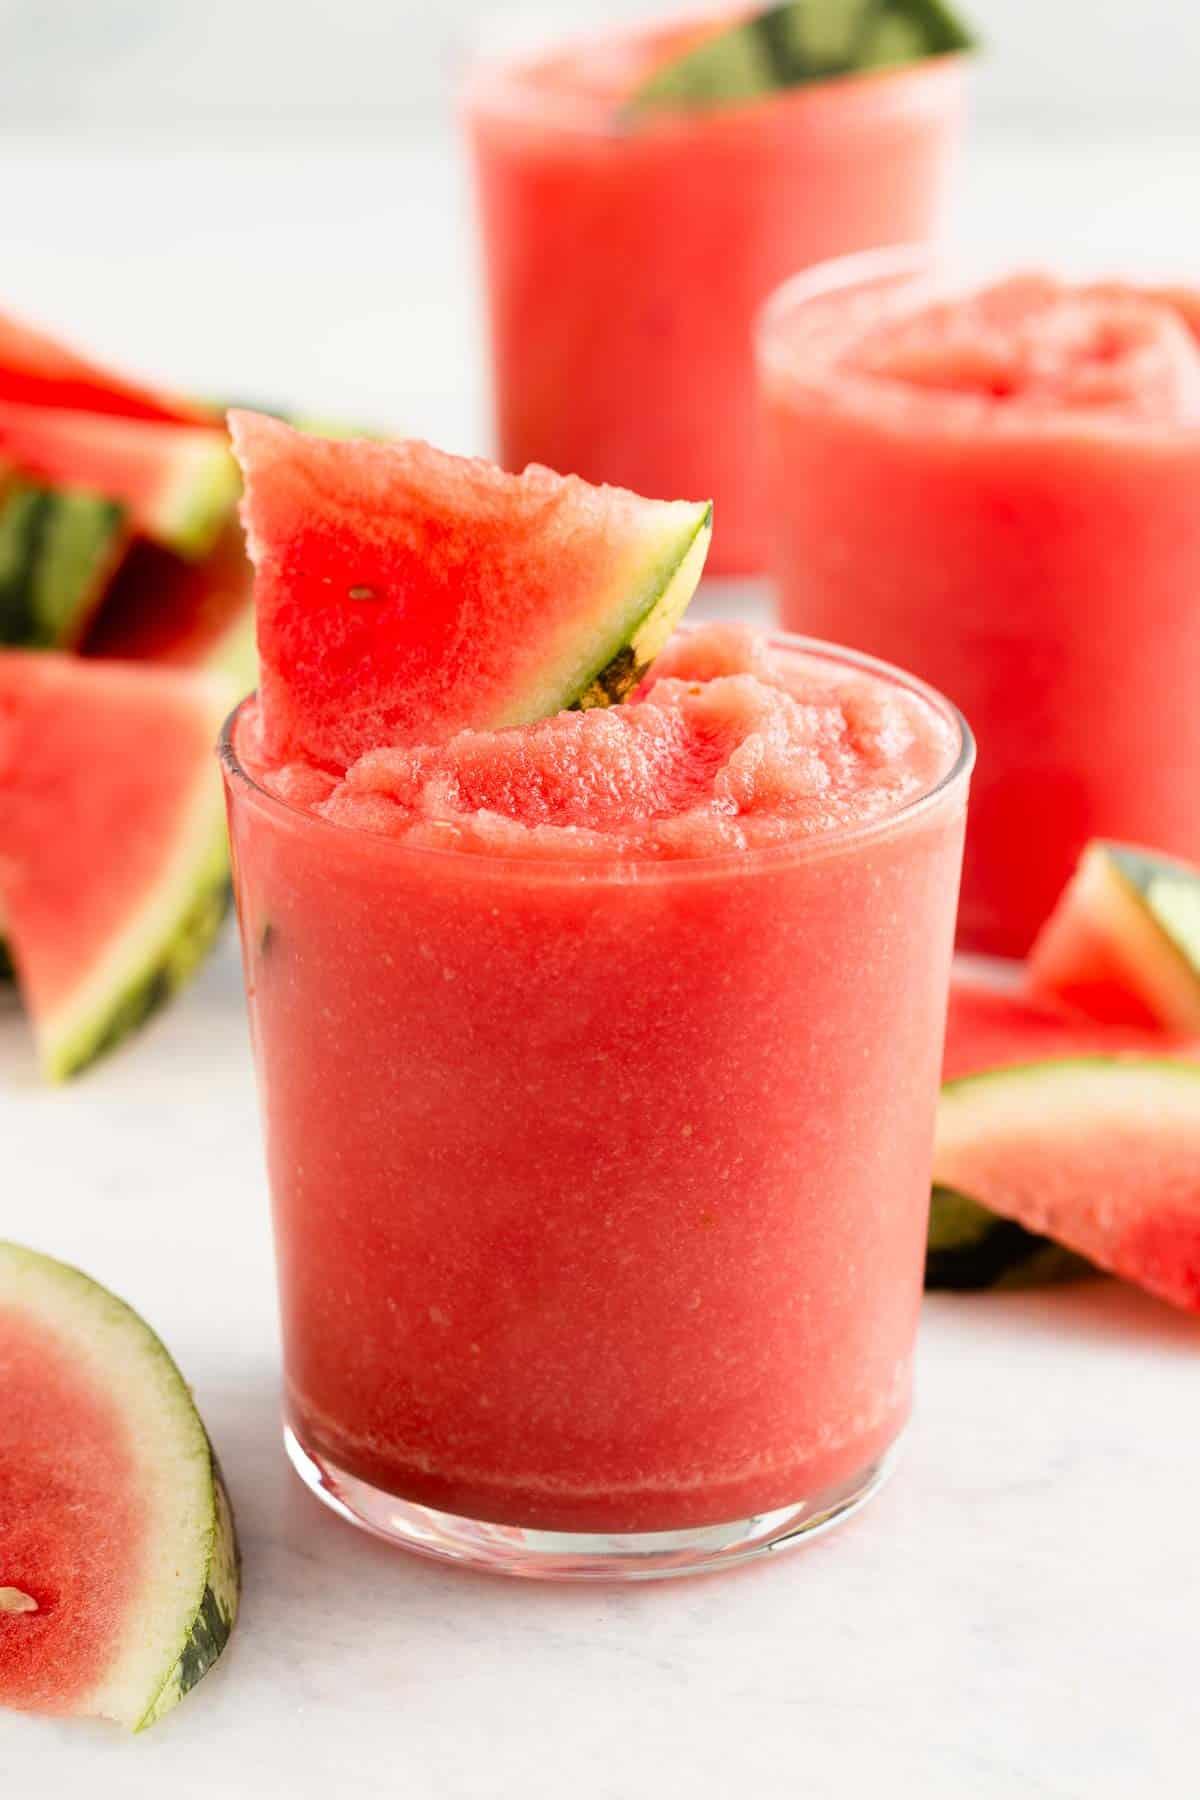 close up on a pink slushy drink garnished with a watermelon slice